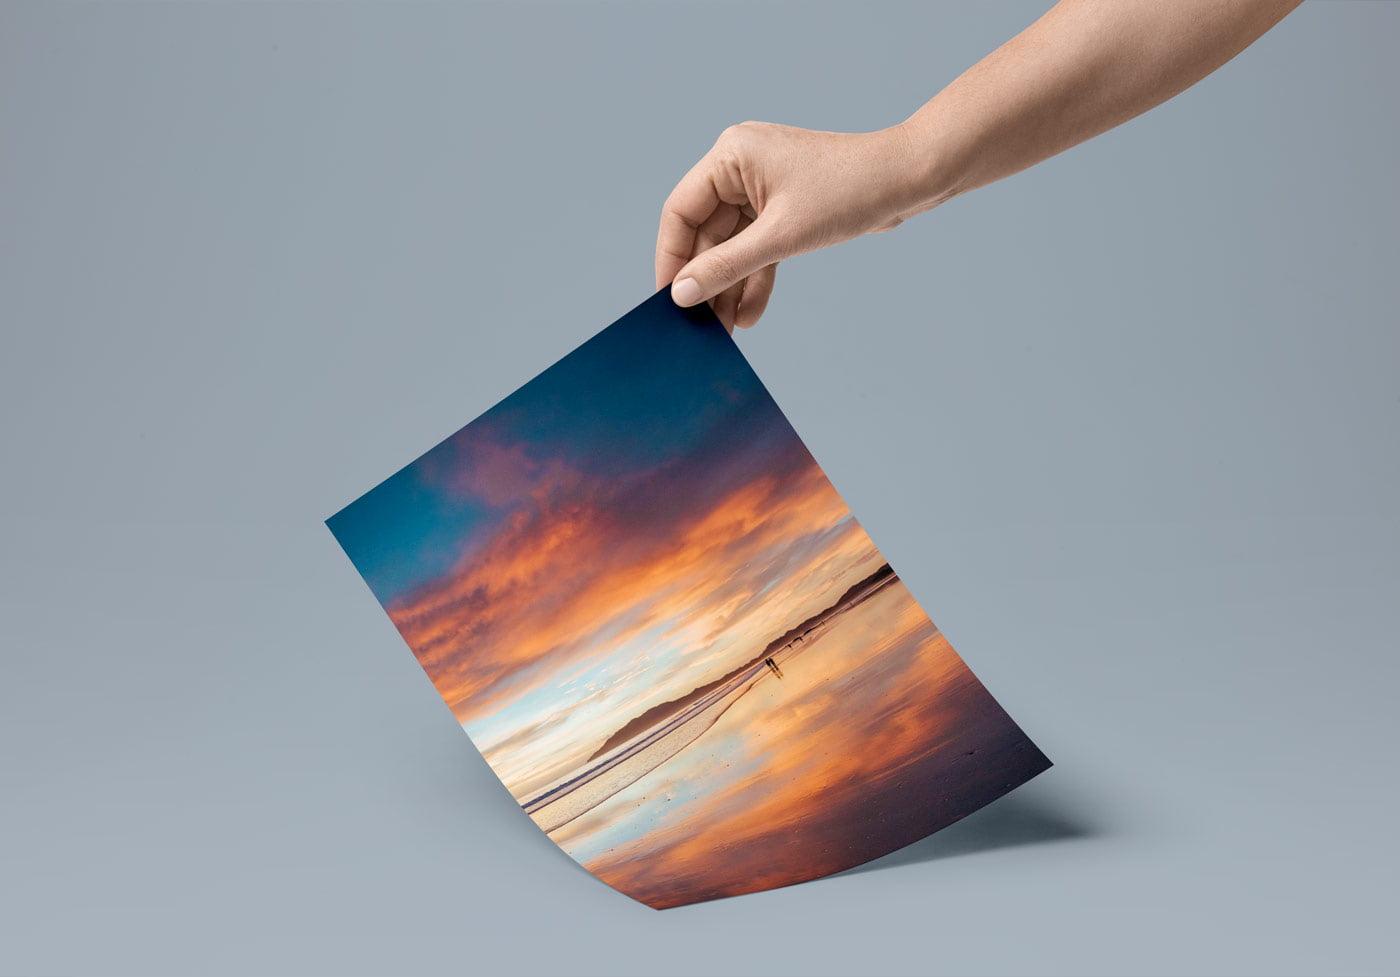 sunse photography 7 - آموزش عکاسی از غروب آفتاب